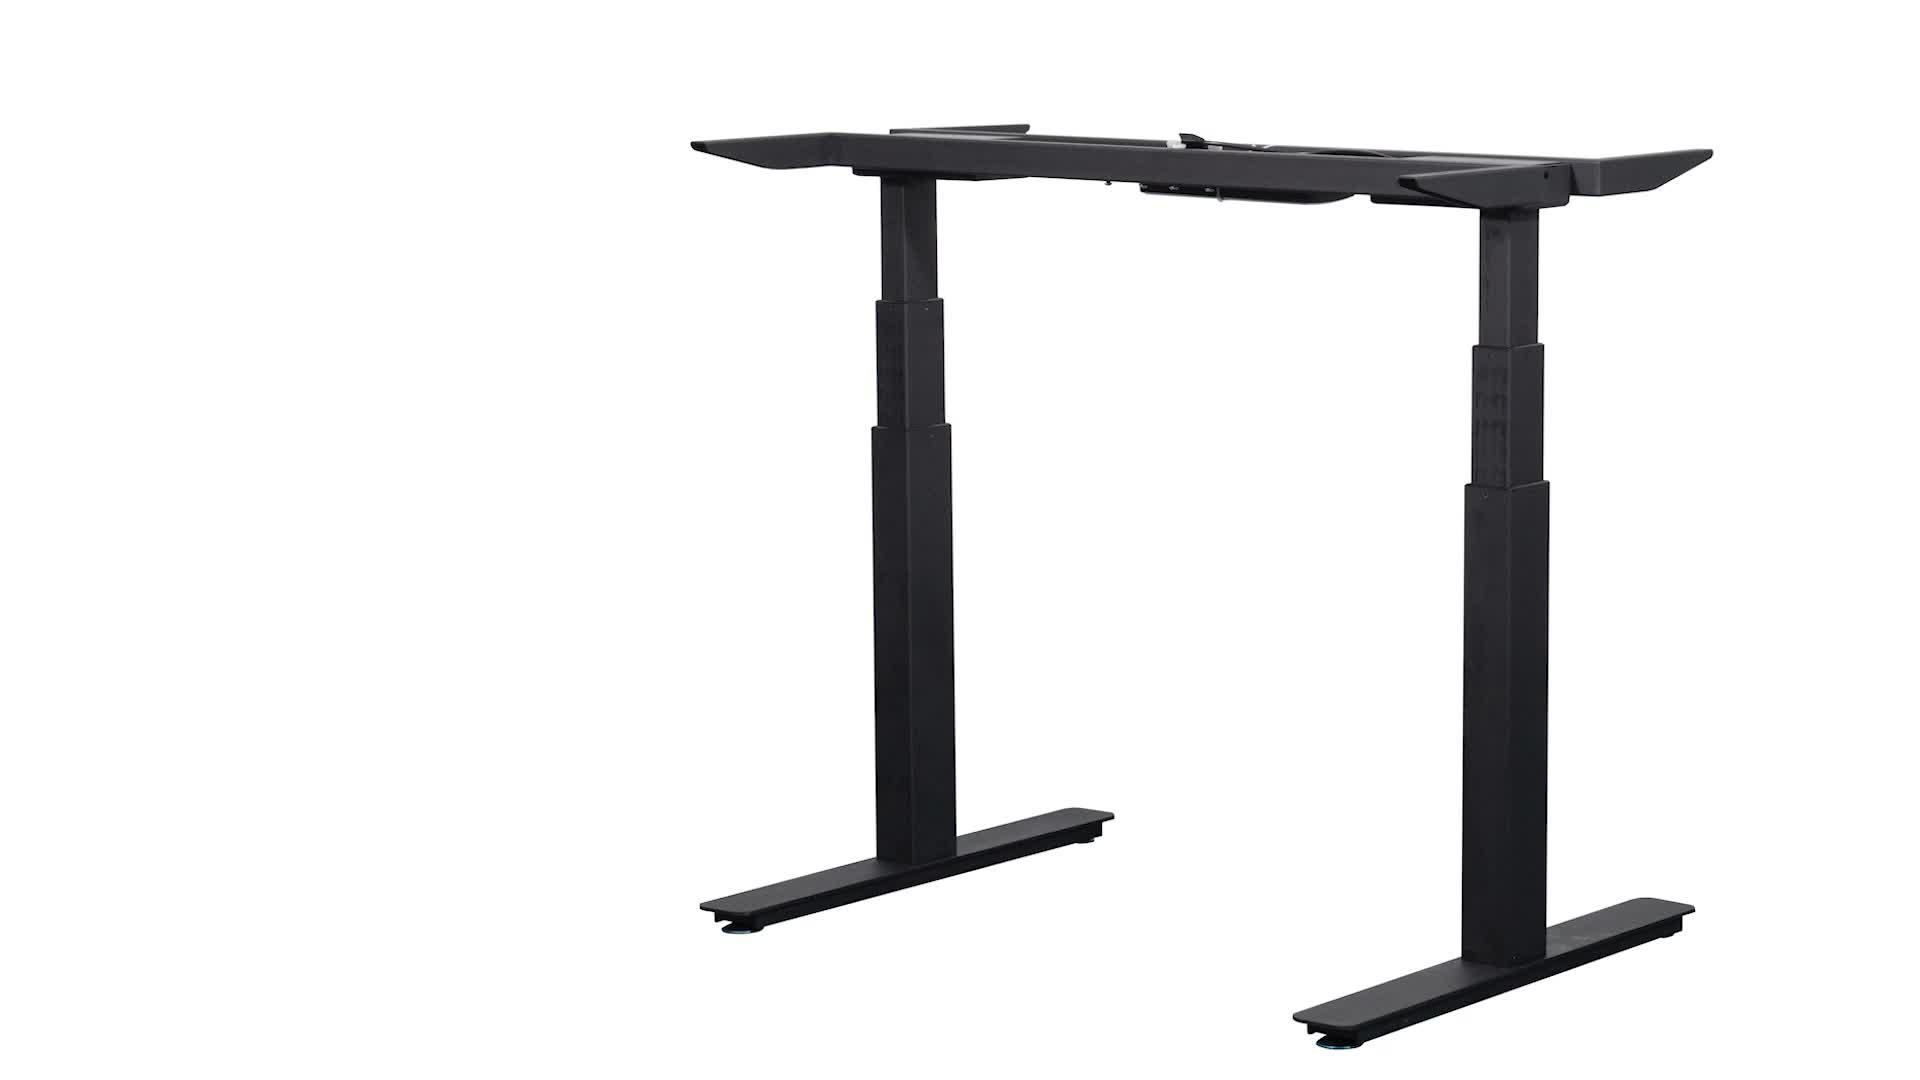 Popular style in European market height adjustable sit stand ergonomic desk